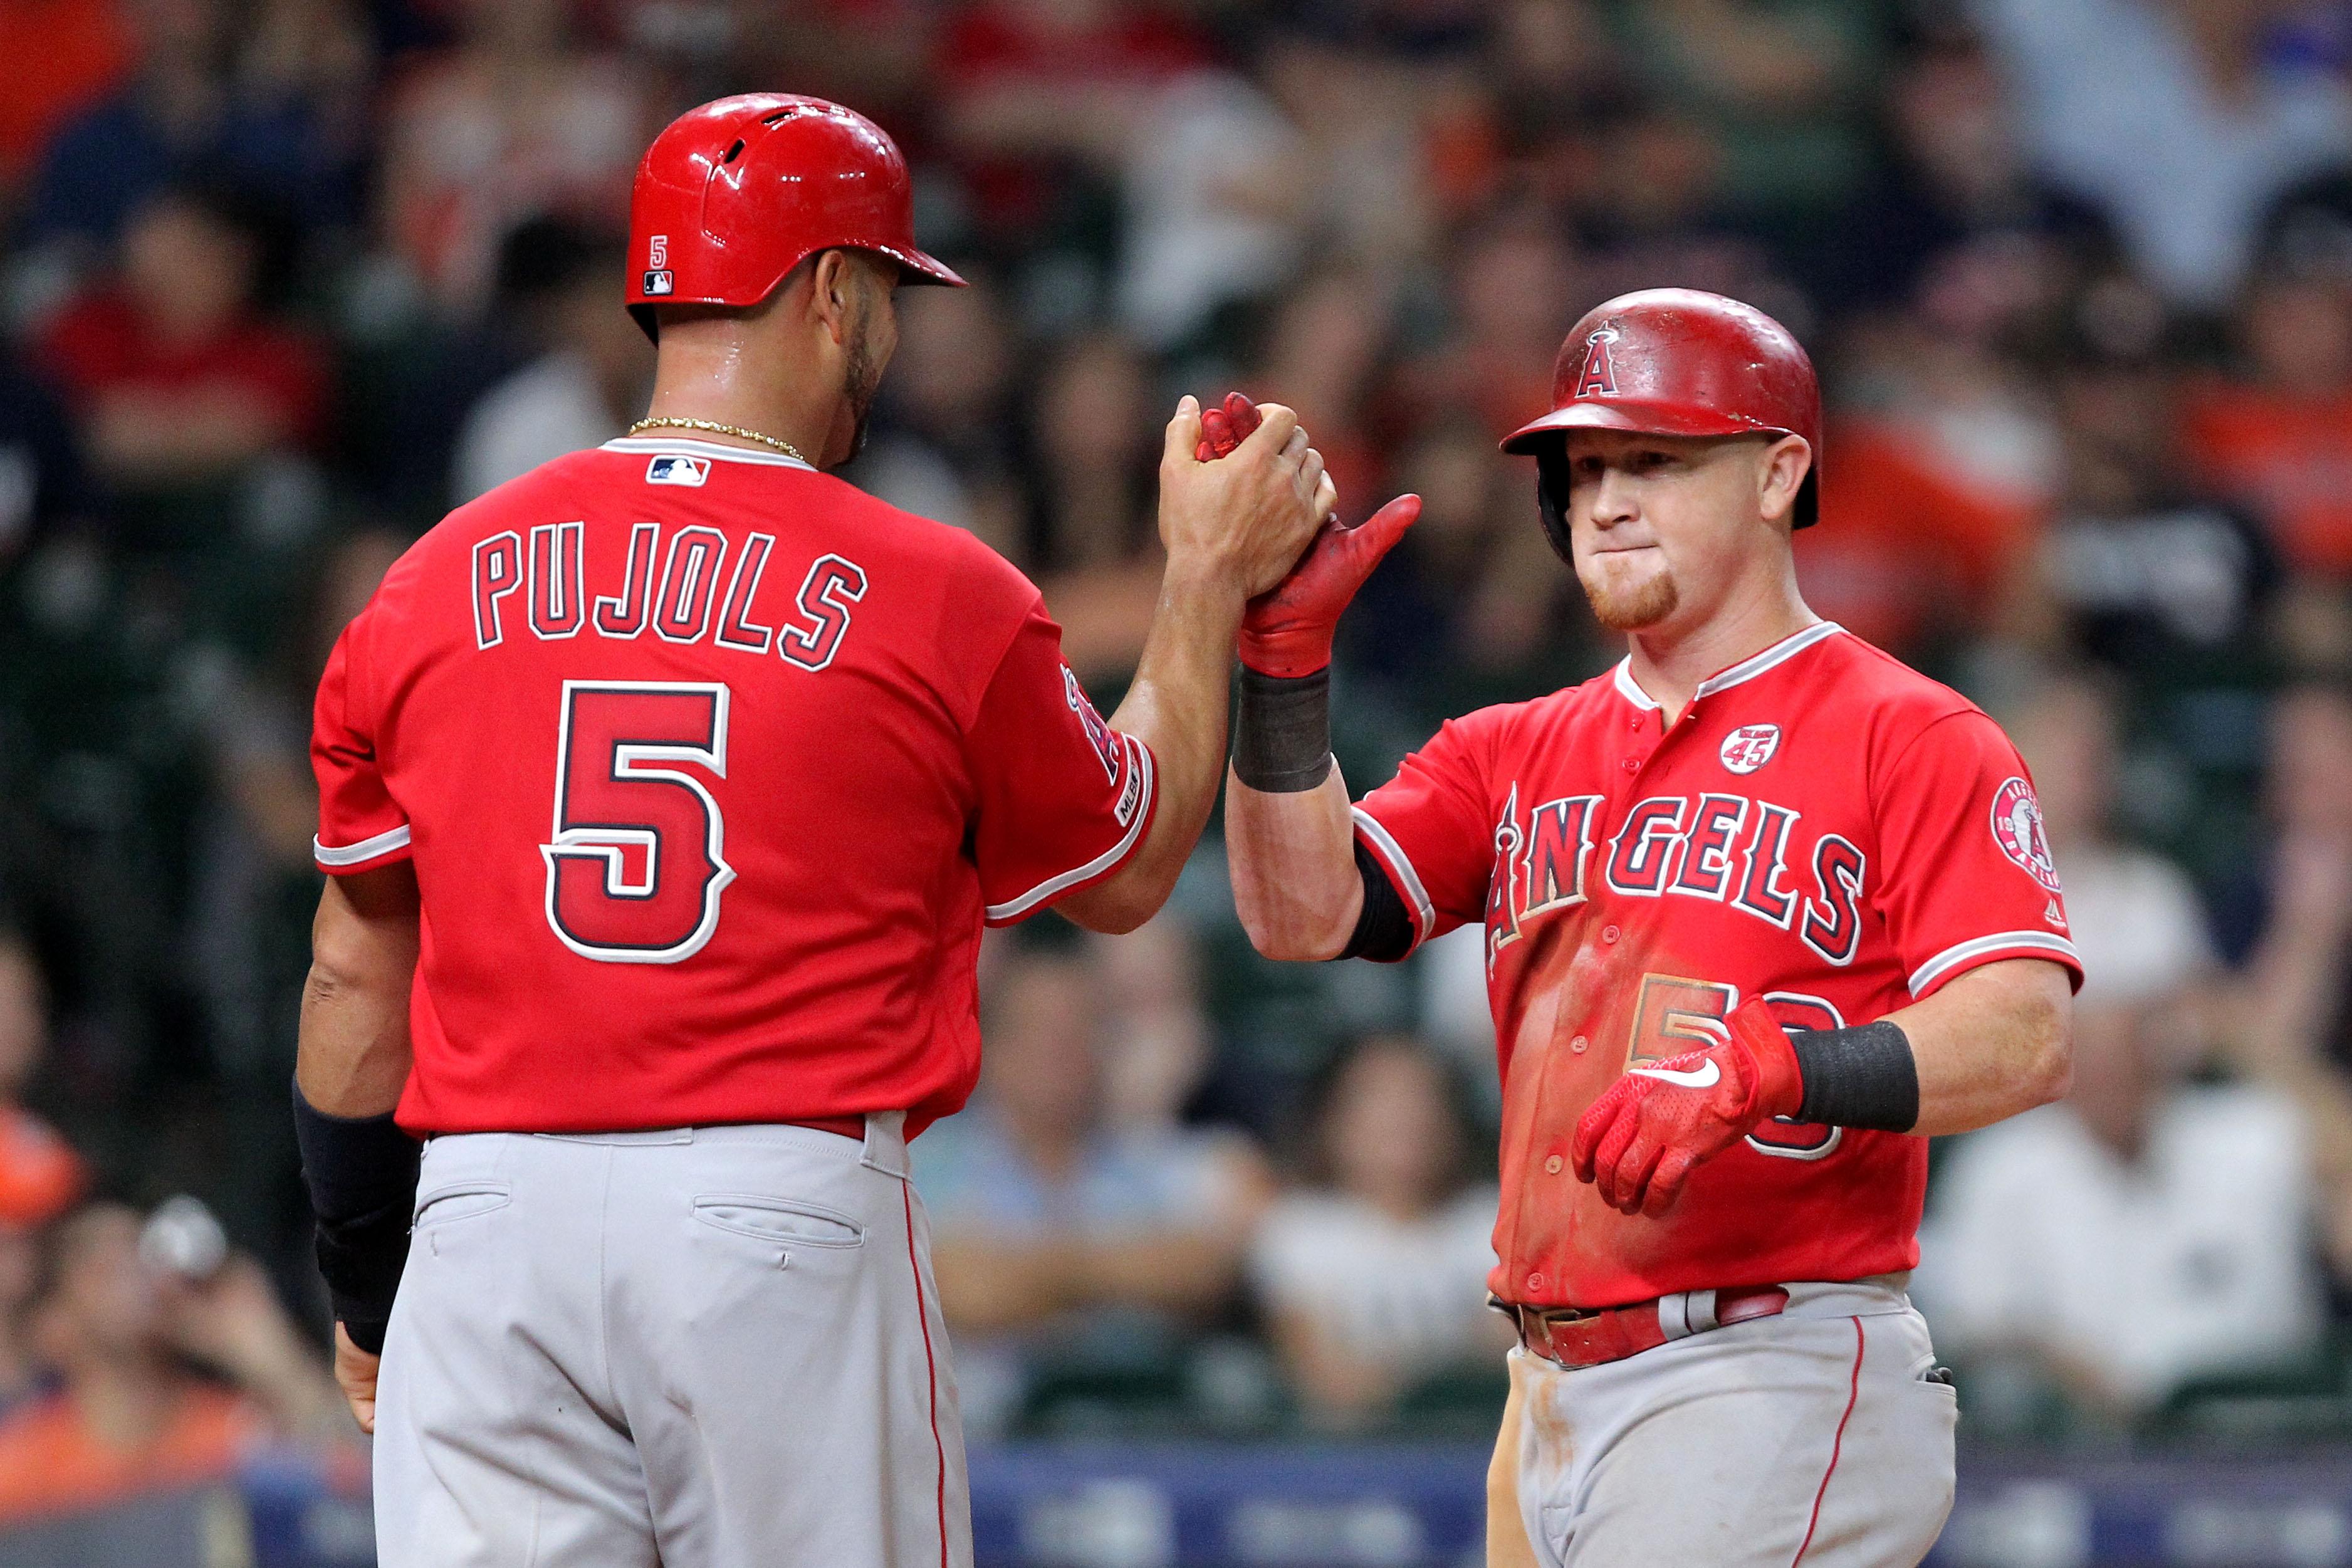 MLB: Los Angeles Angels at Houston Astros